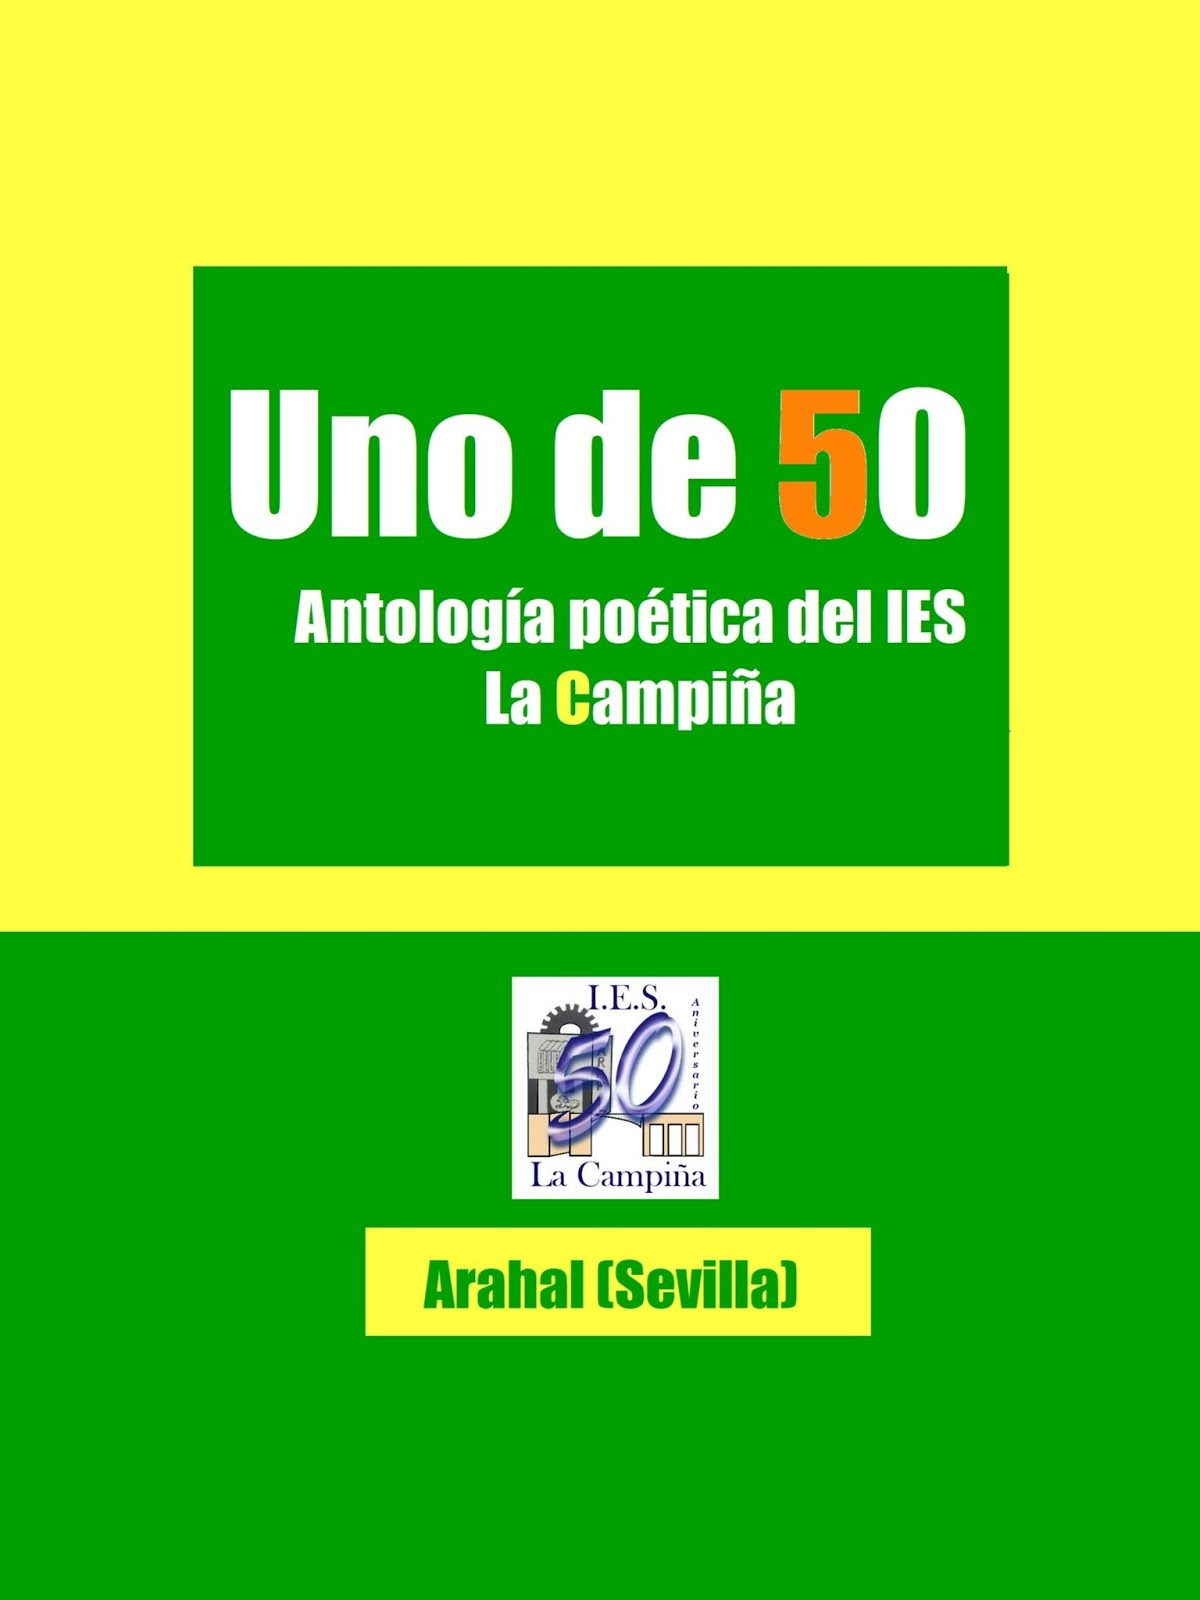 DESCARGA GRATIS, O COMPRA, UNO DE 50